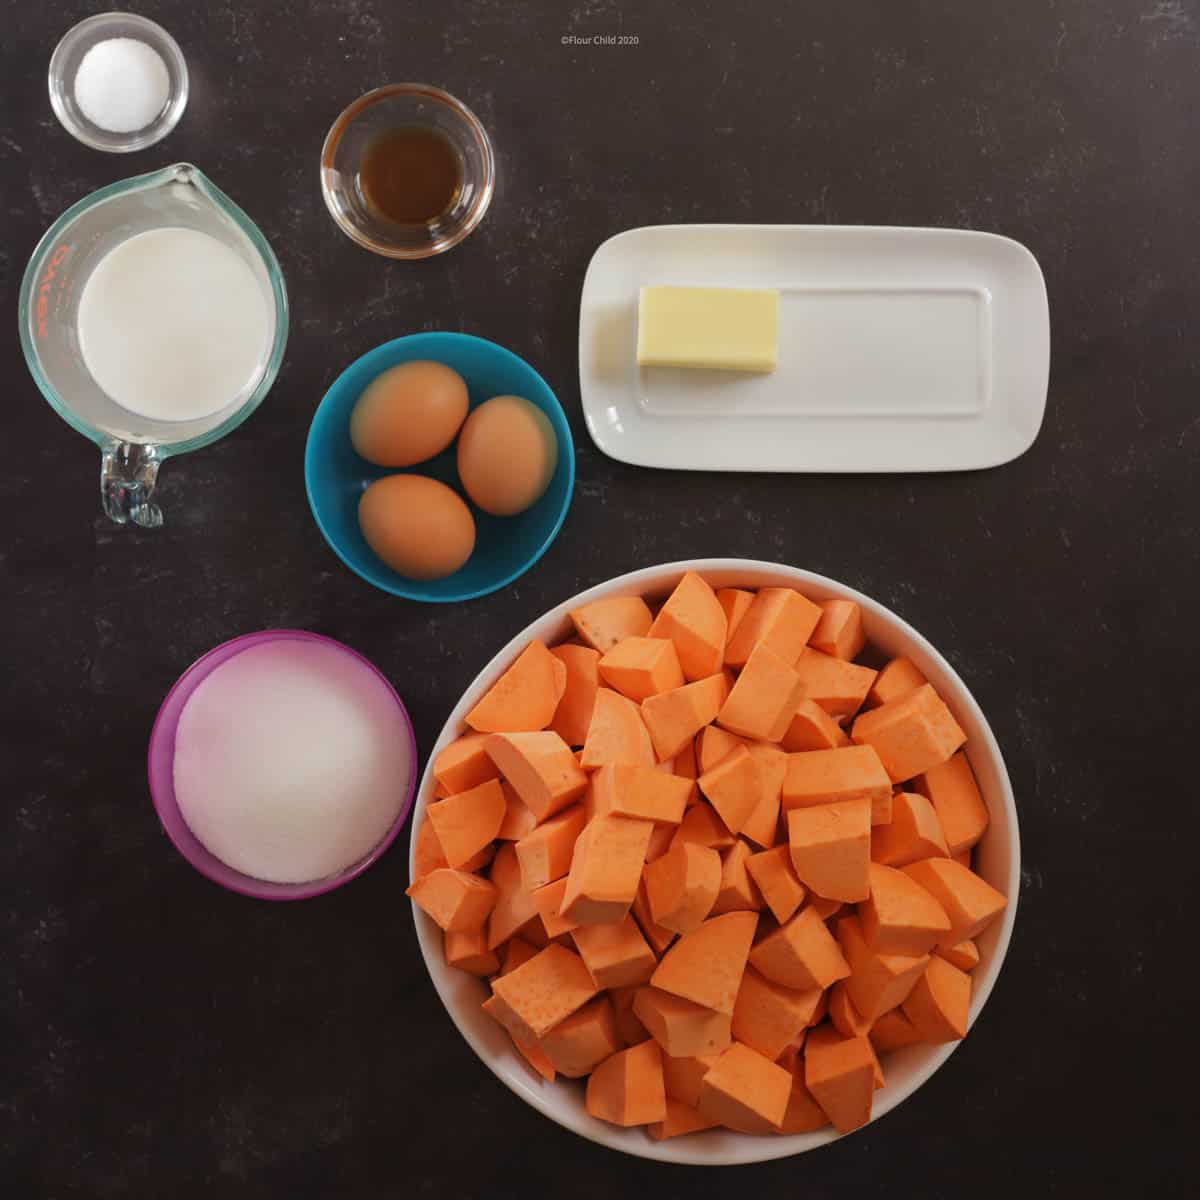 Ingredients for sweet potato casserole